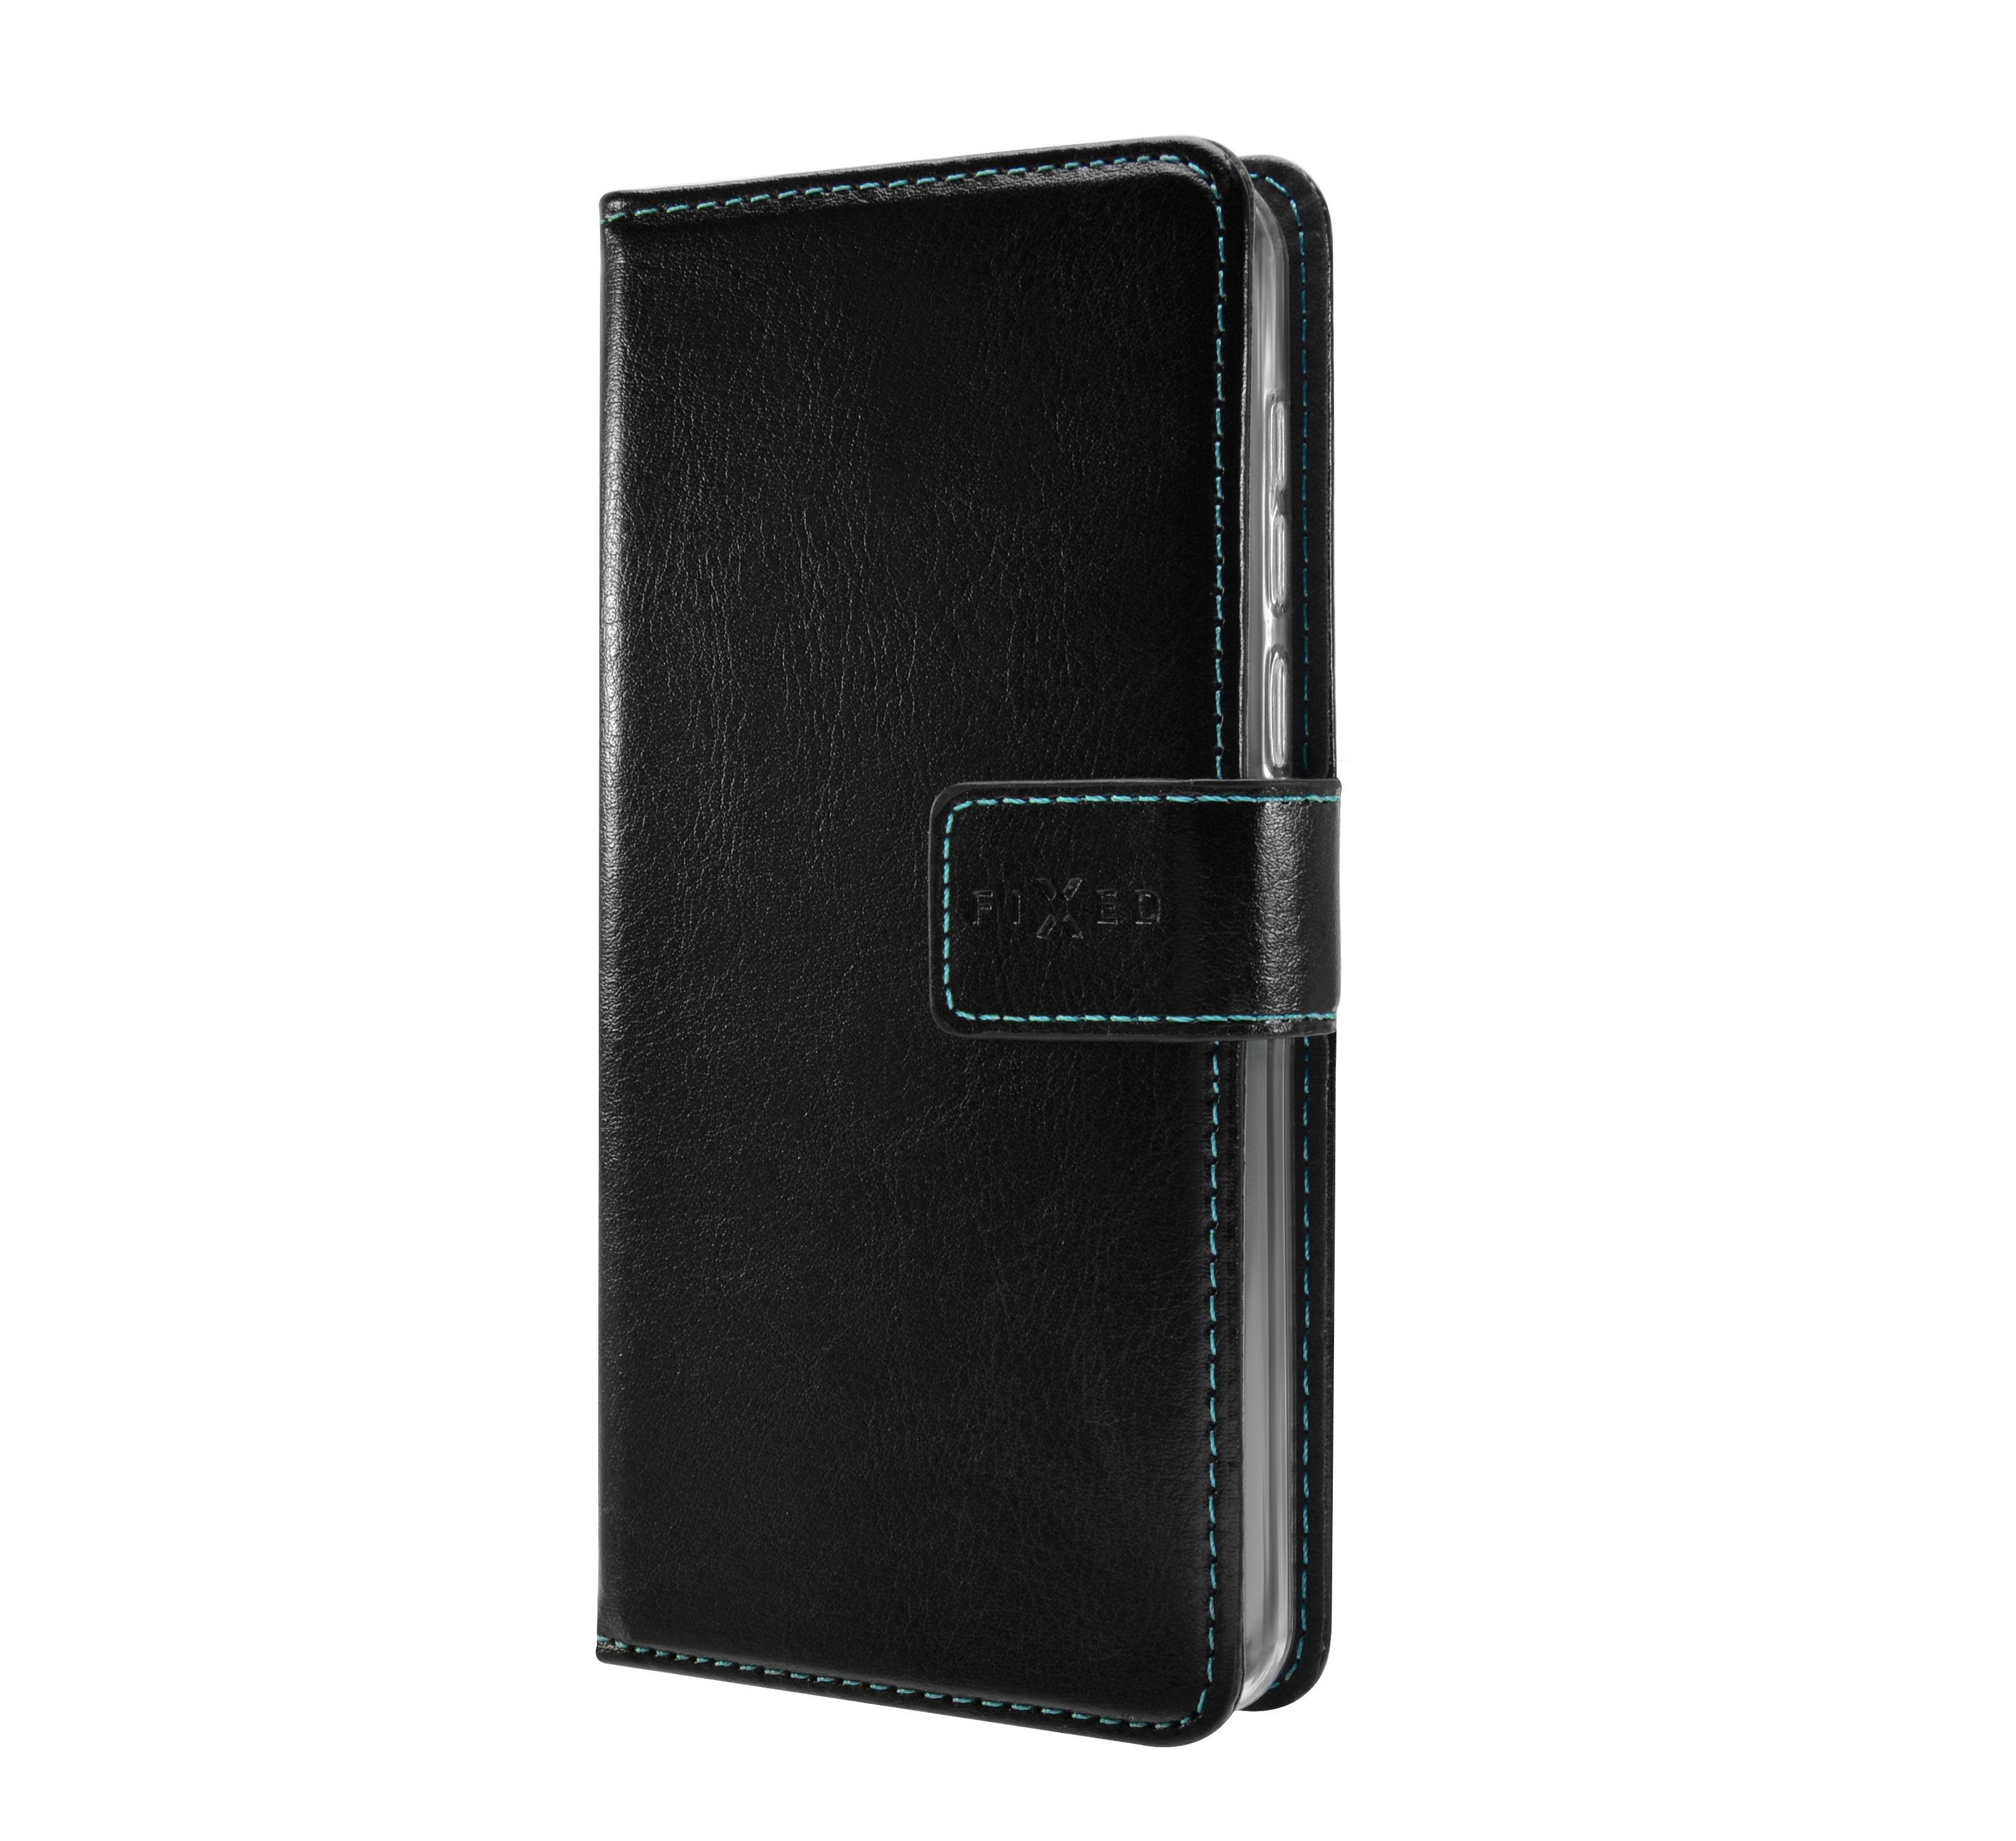 Pouzdro typu kniha FIXED Opus pro Huawei P40 Lite e, černé